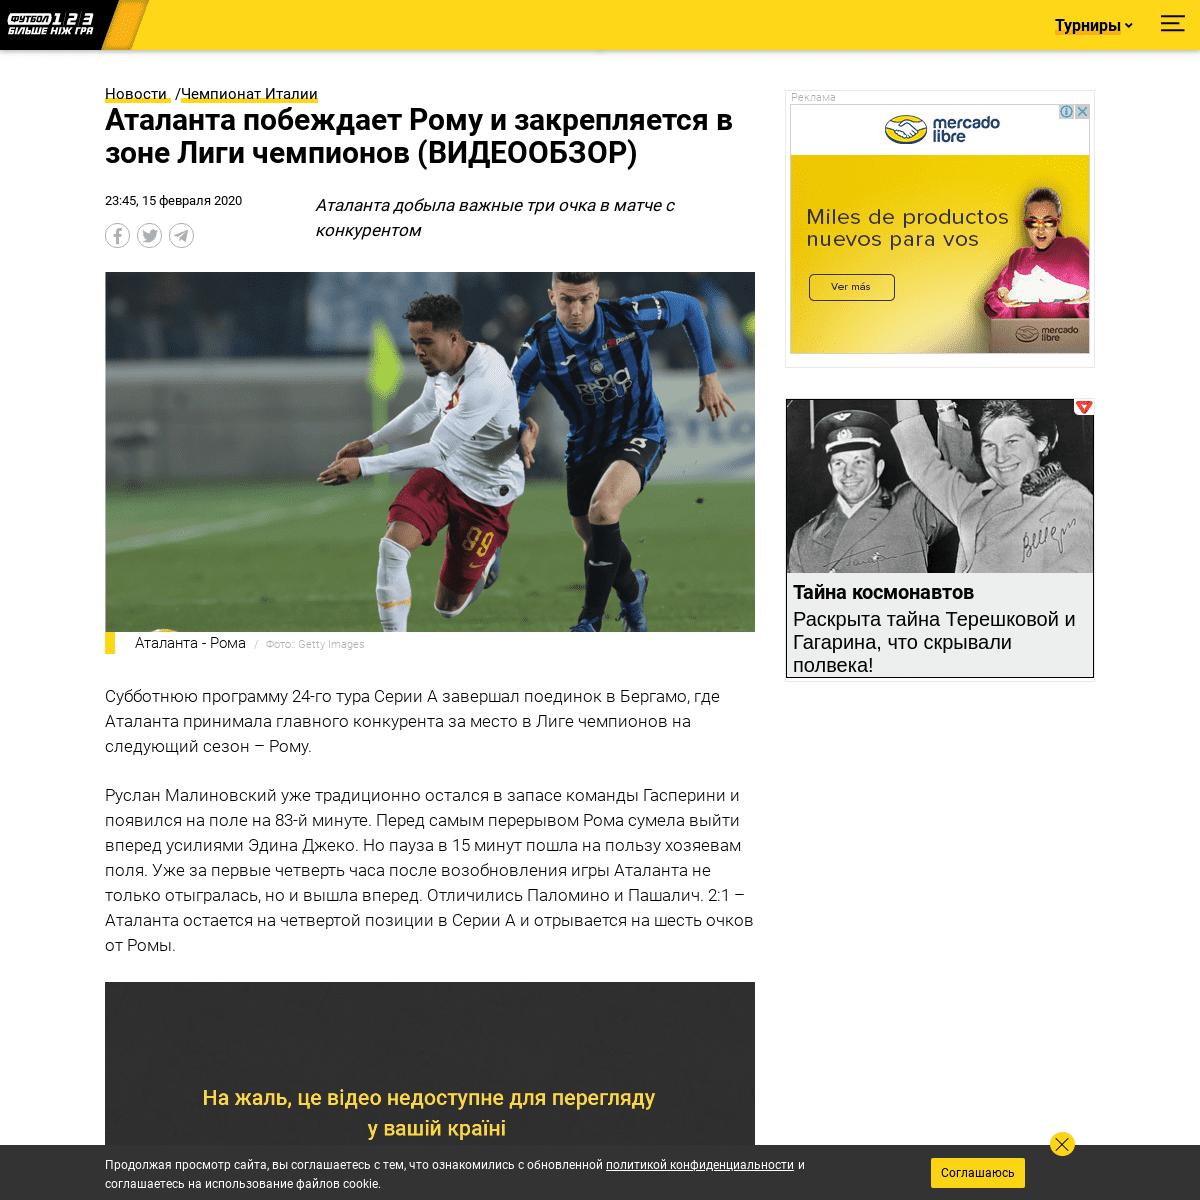 Аталанта - Рома 2-1. Обзор матча Серии А 15.02.2020 - Телеканал Футбол